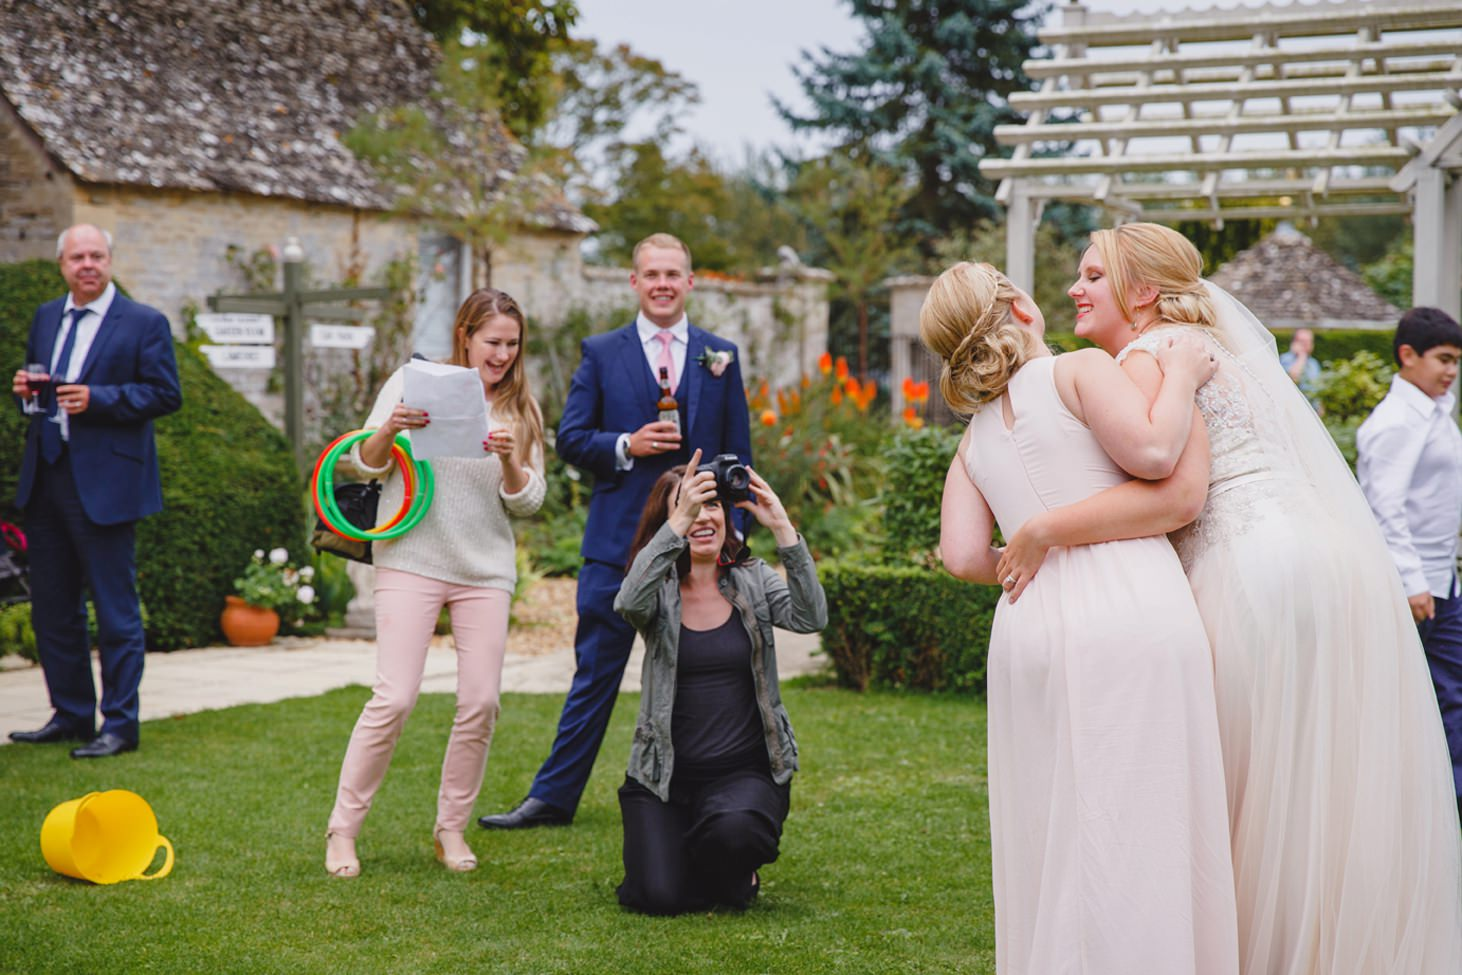 oxfordshire wedding photography bride and bridesmaid marryoke